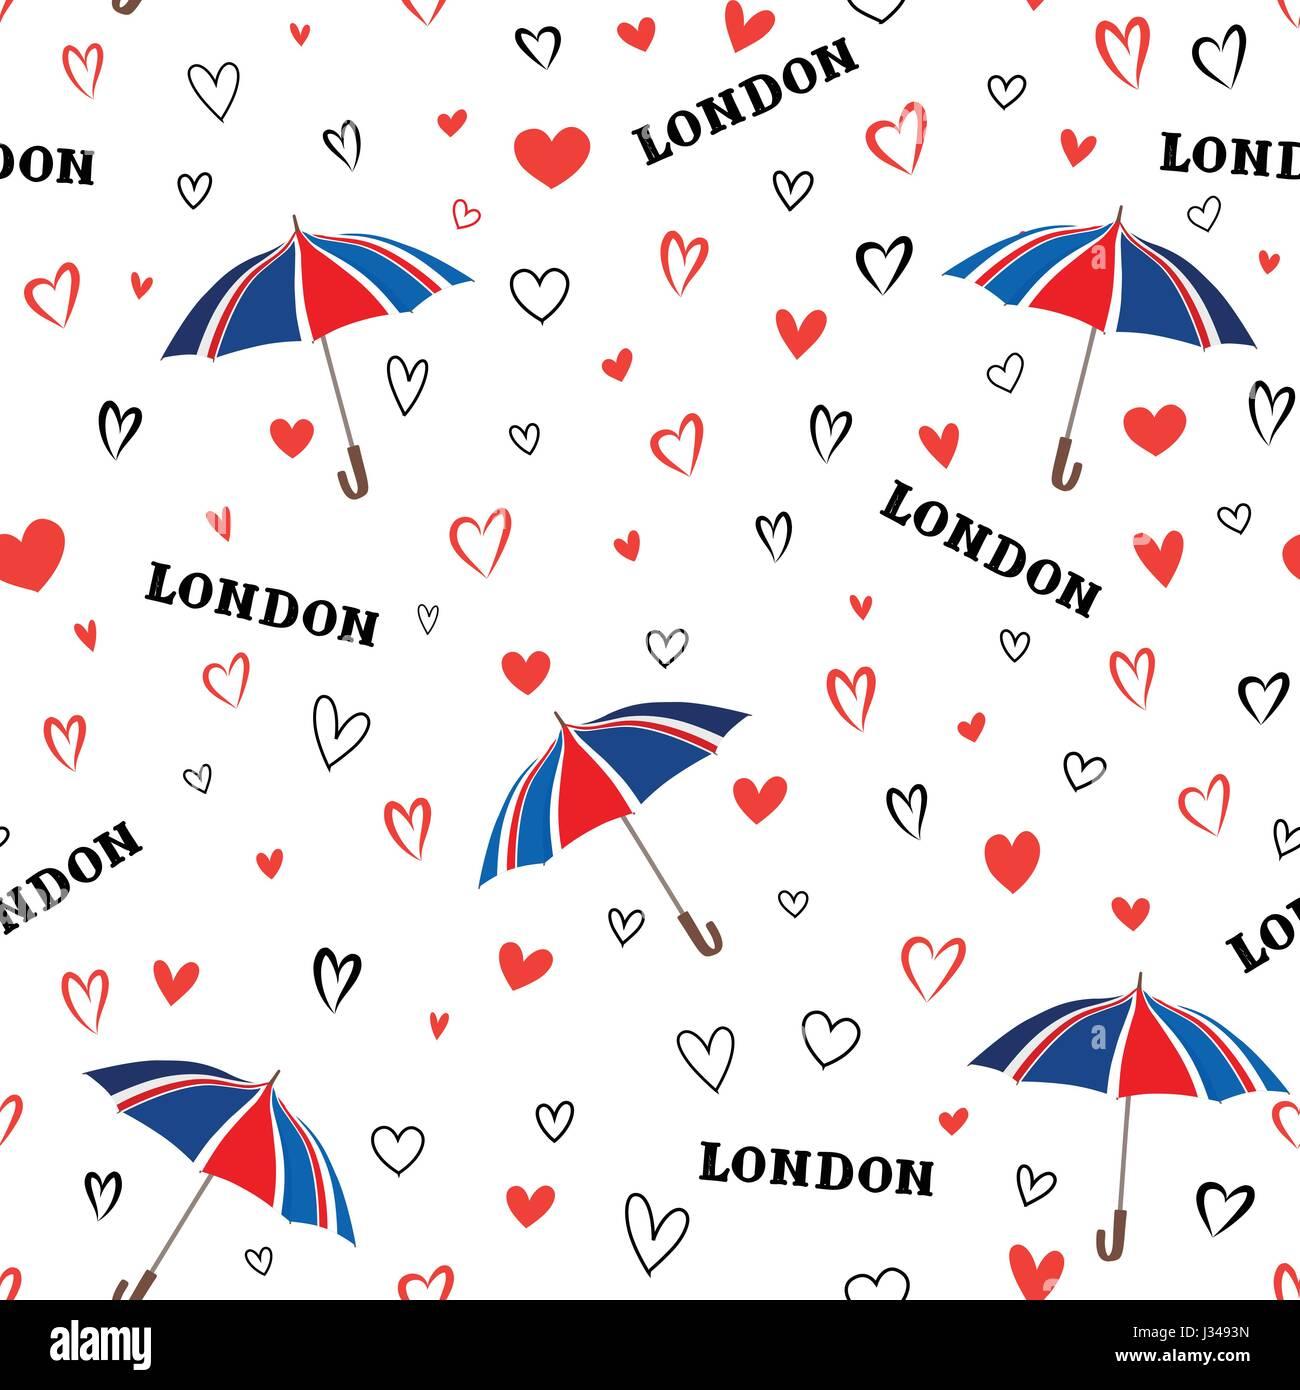 Travel London Seamless Pattern With Love Hearts And Umbrella British Fashion WallpaperEuropean Vacation